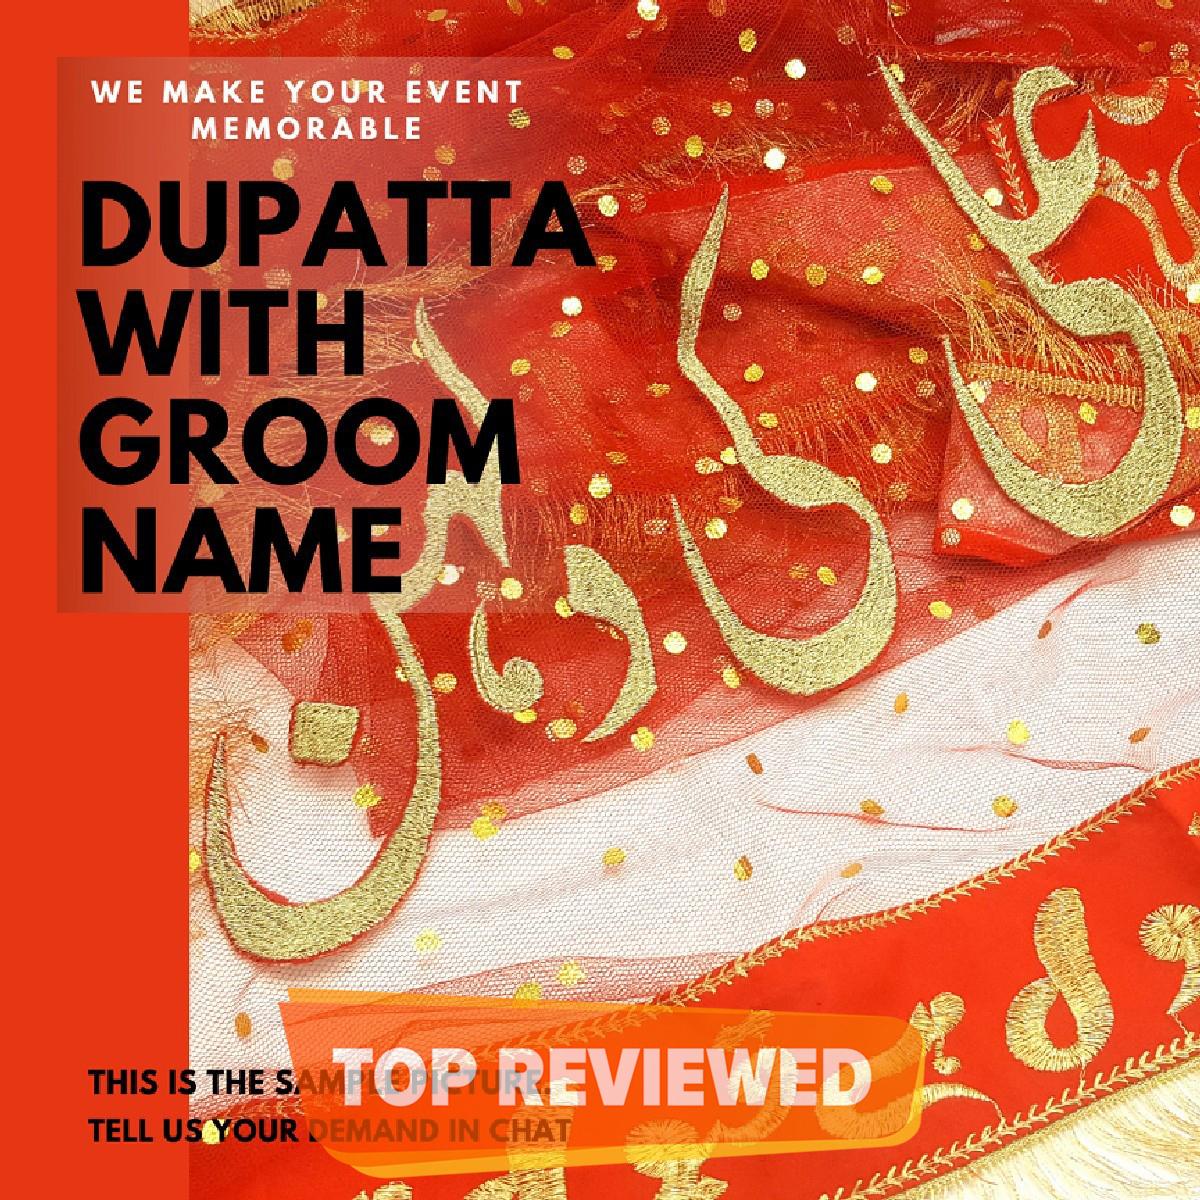 Qabool Hai with Groom Name Customization Bridal Net Fancy Dupatta Wedding Nikah Party - RED - Fine Tailored Stitch Nikkah Duppatta For Shadi Qubool Hai Lace Dupata For Girls Women